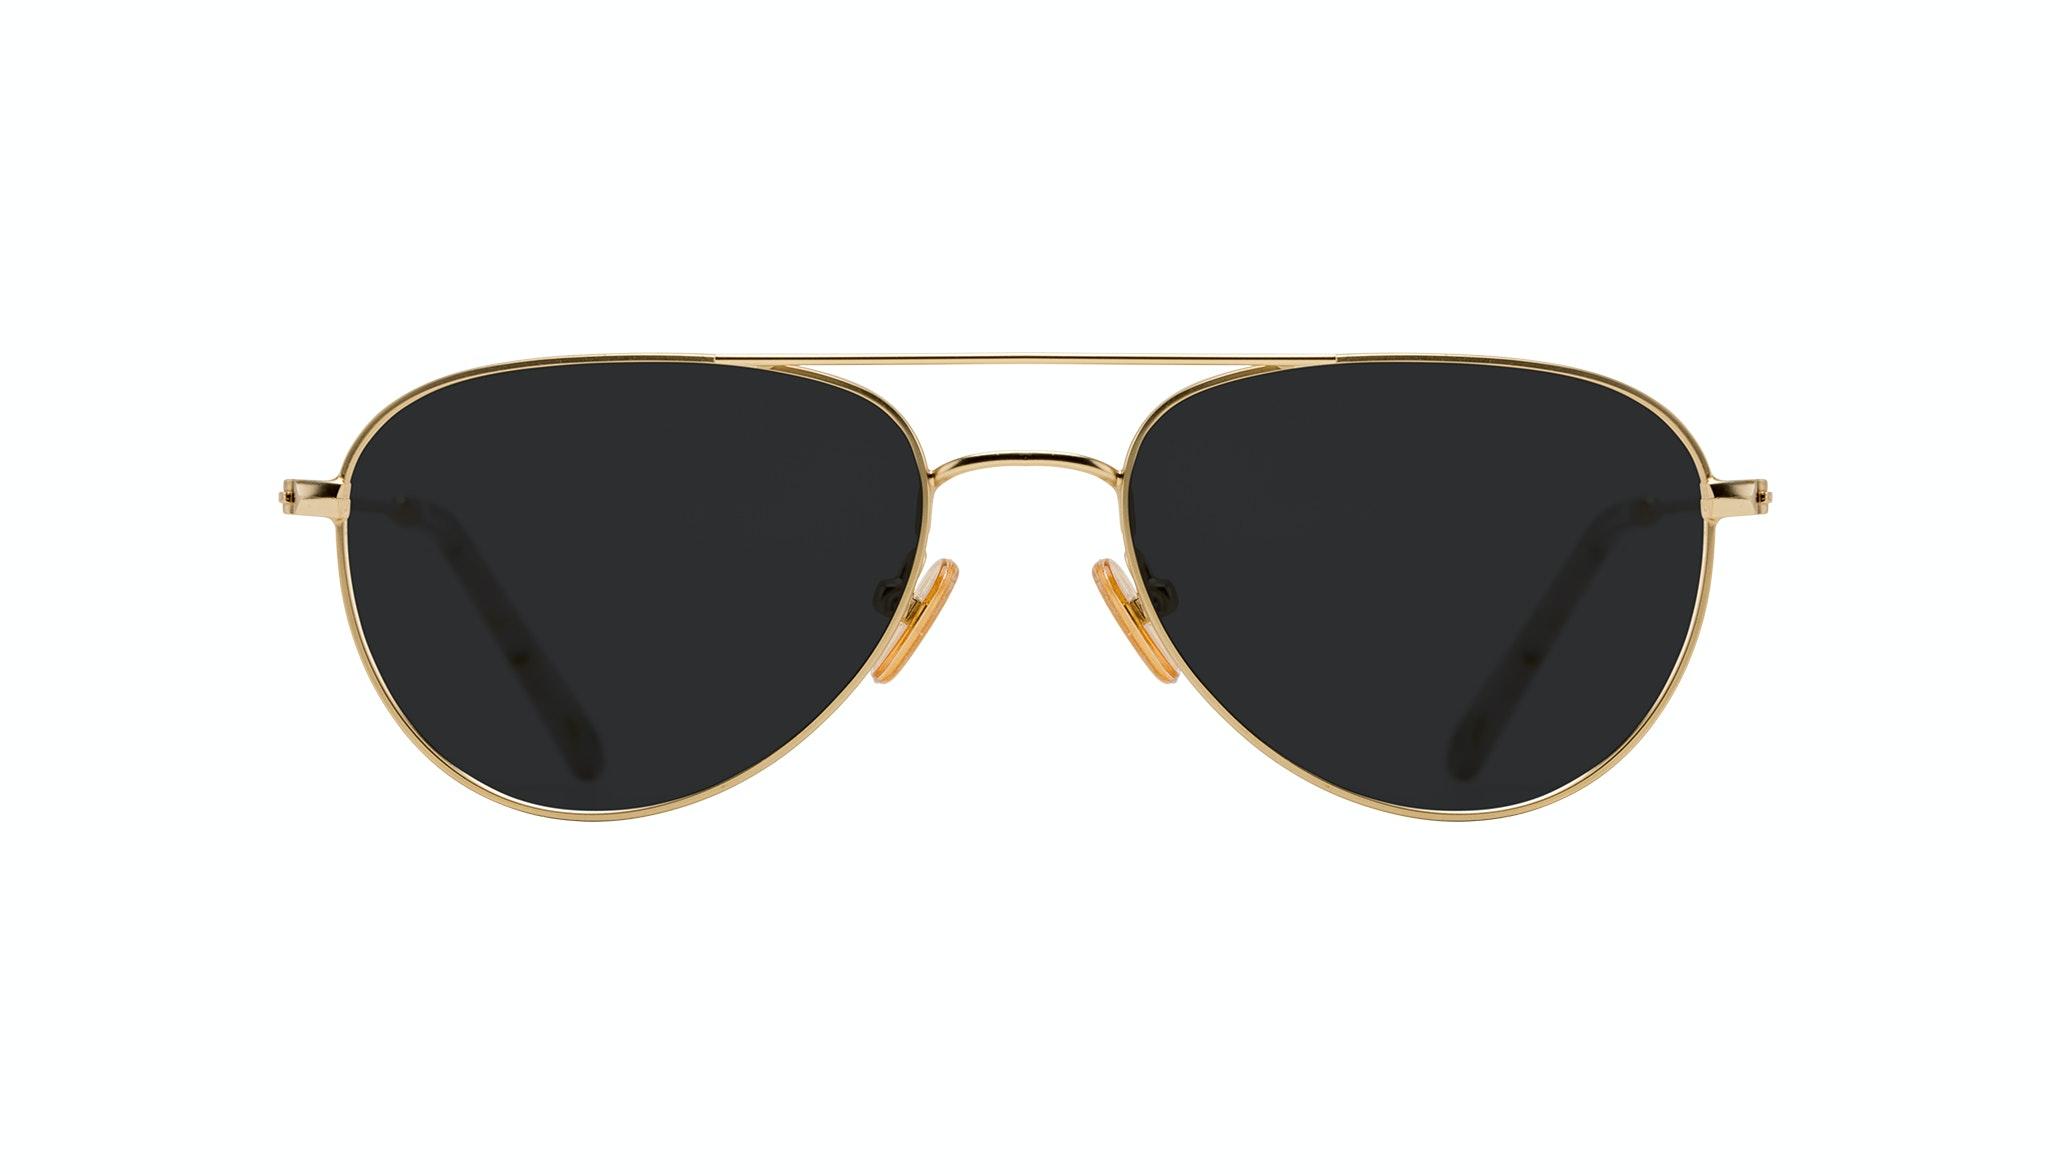 Affordable Fashion Glasses Aviator Sunglasses Women Figure Gold Front